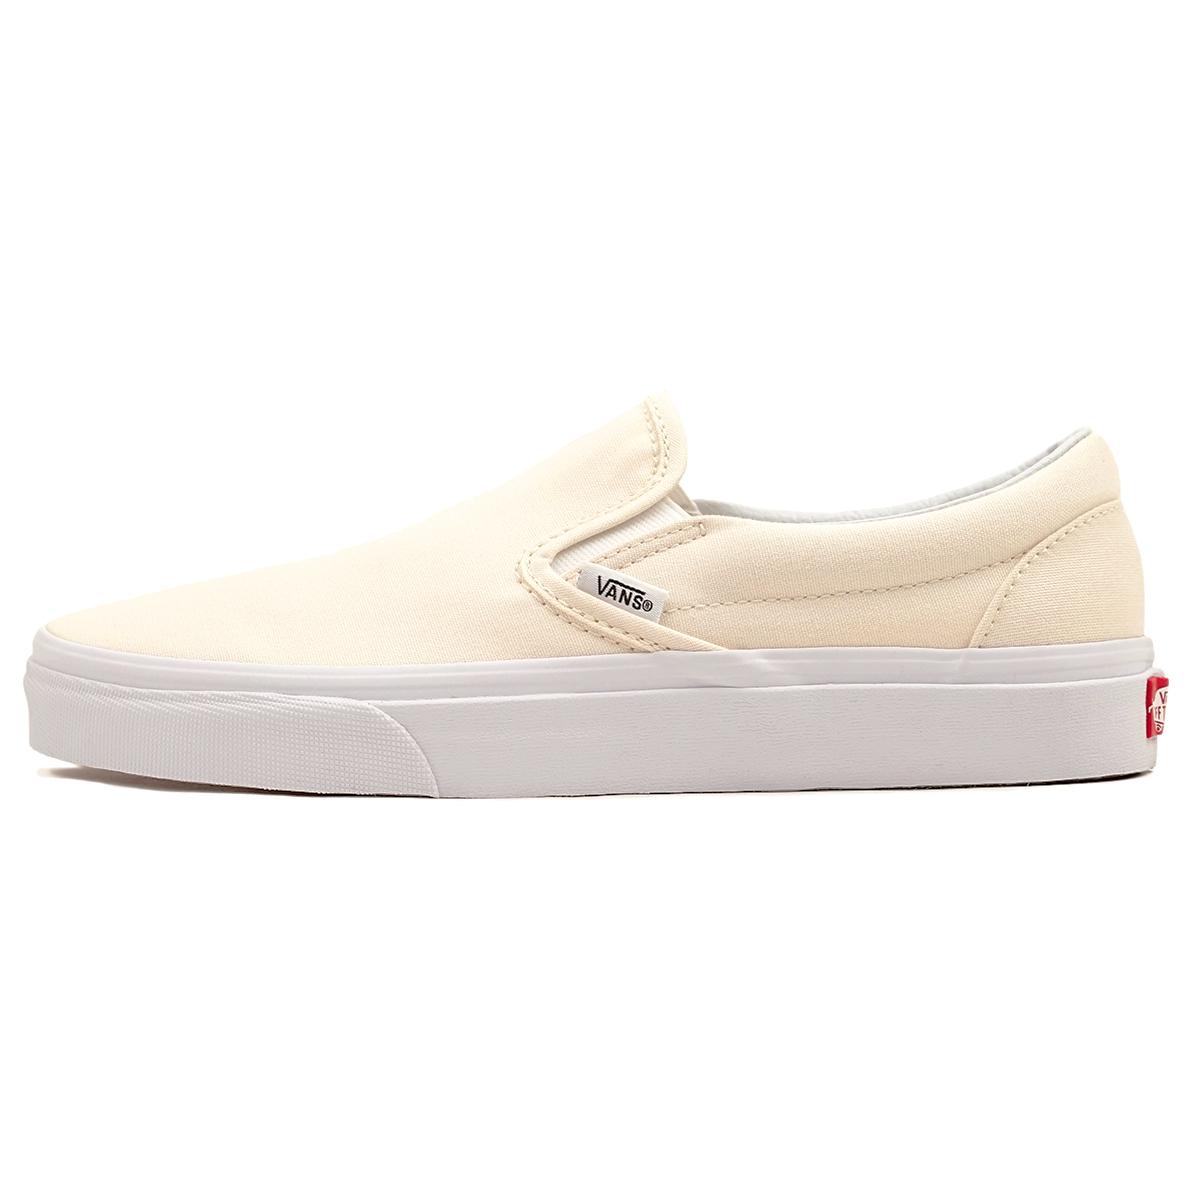 ace4cfee6fdedf Jalana  Vans VANS United States standard classical music slip-ons off-white  (station wagons slip-on CLASSIC SLIP-ON White)